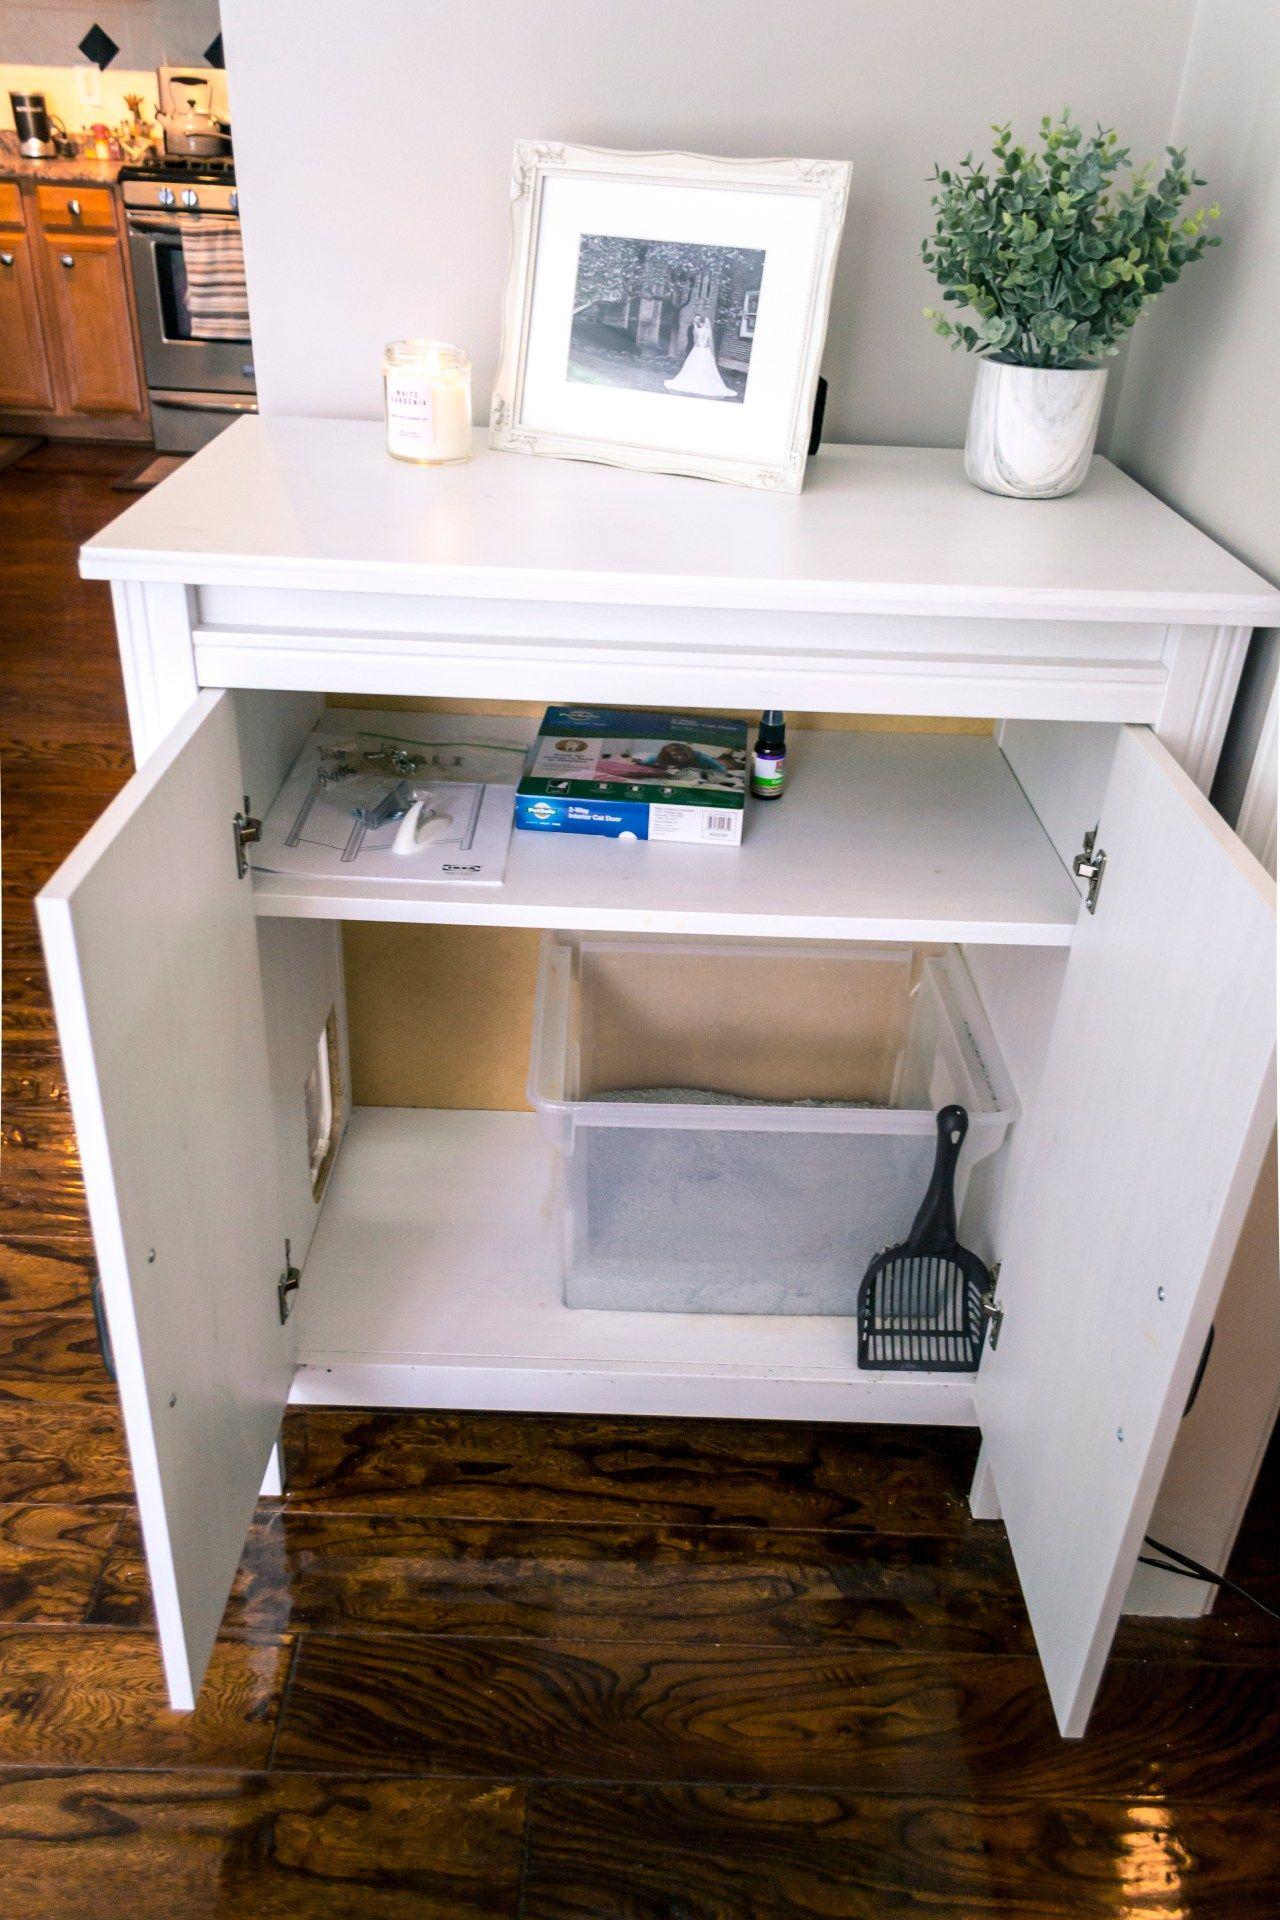 Ikea Brusali Hack Litter Box Cabinet Tidy And Tasty Ikea Brusali Ikea Litter Box